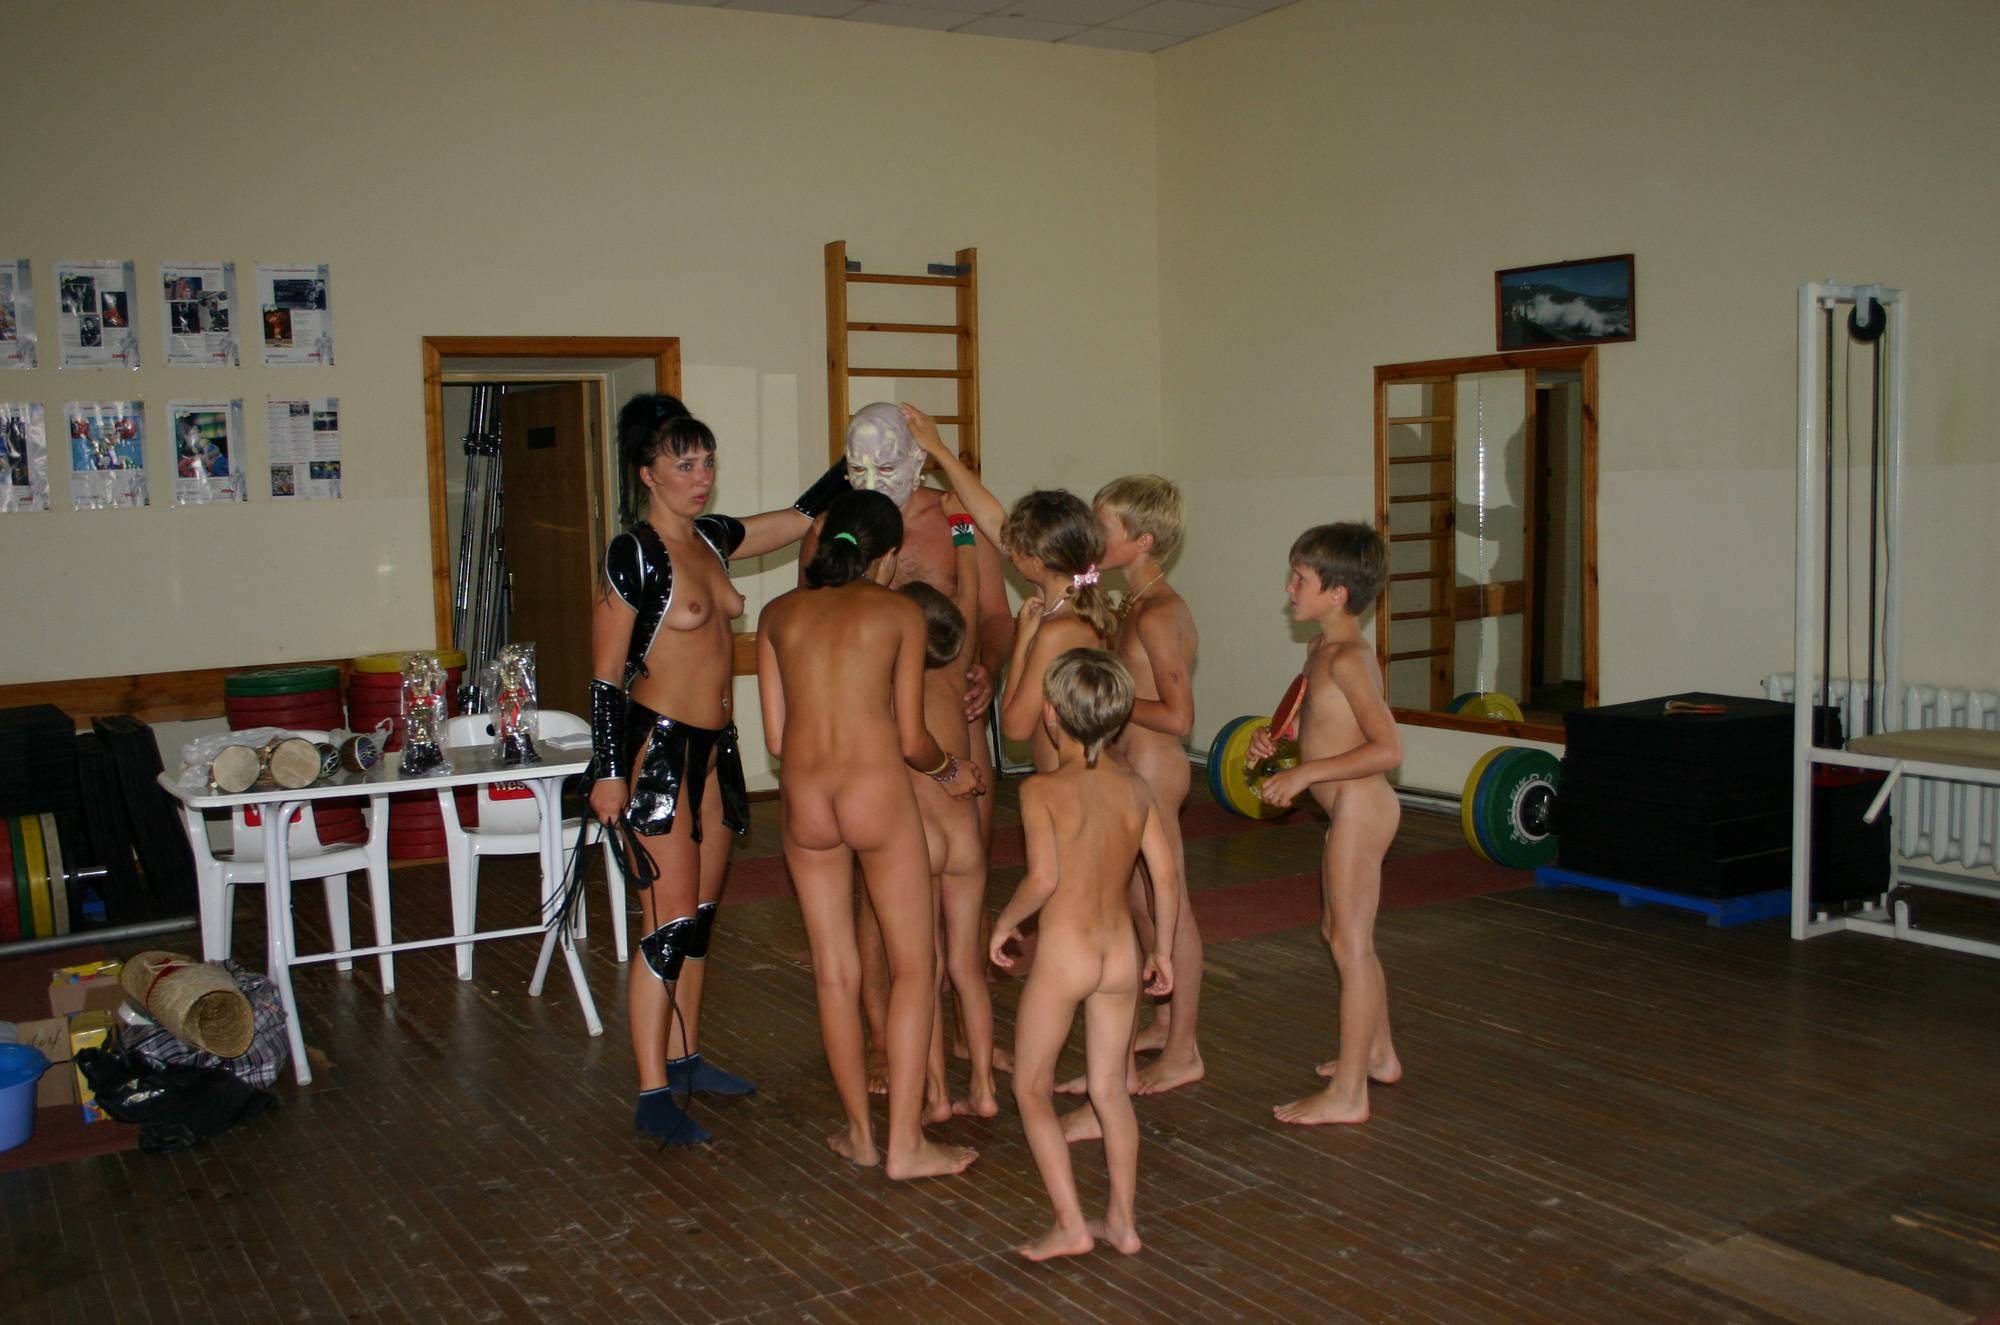 Purenudism Images-Family Gym Group Photos - 2